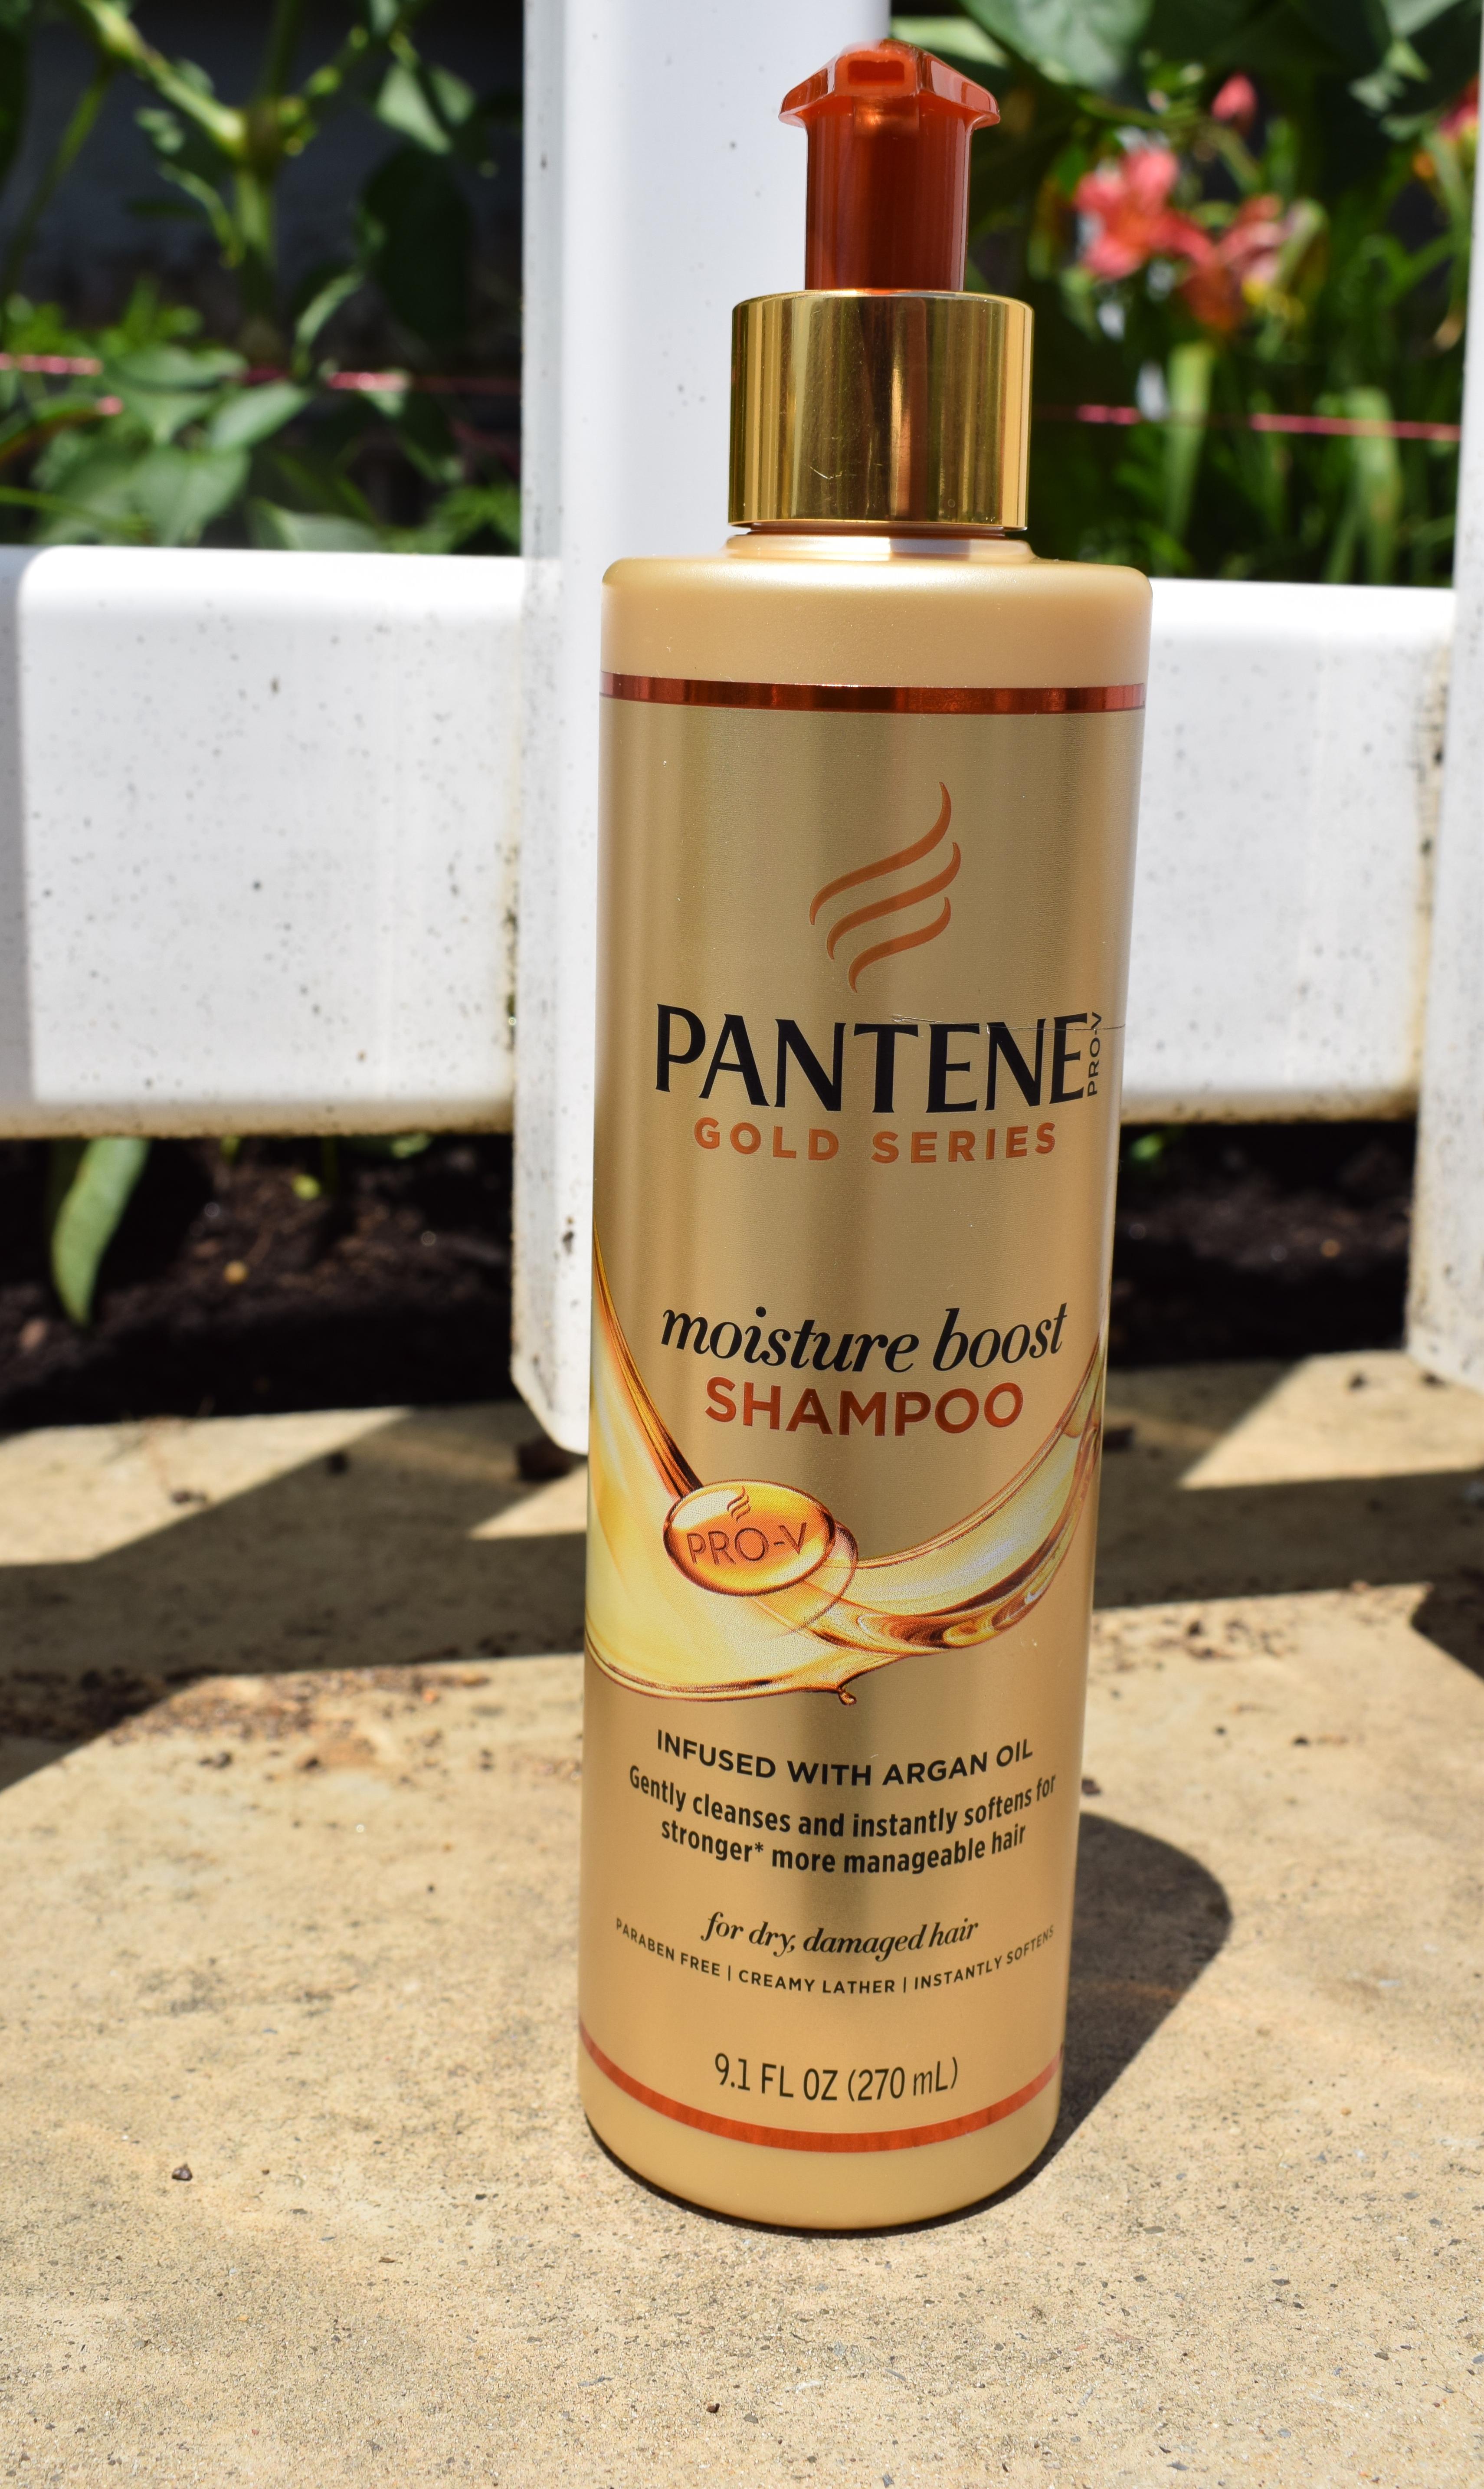 Pantene Pro-V Gold Series Shampoo